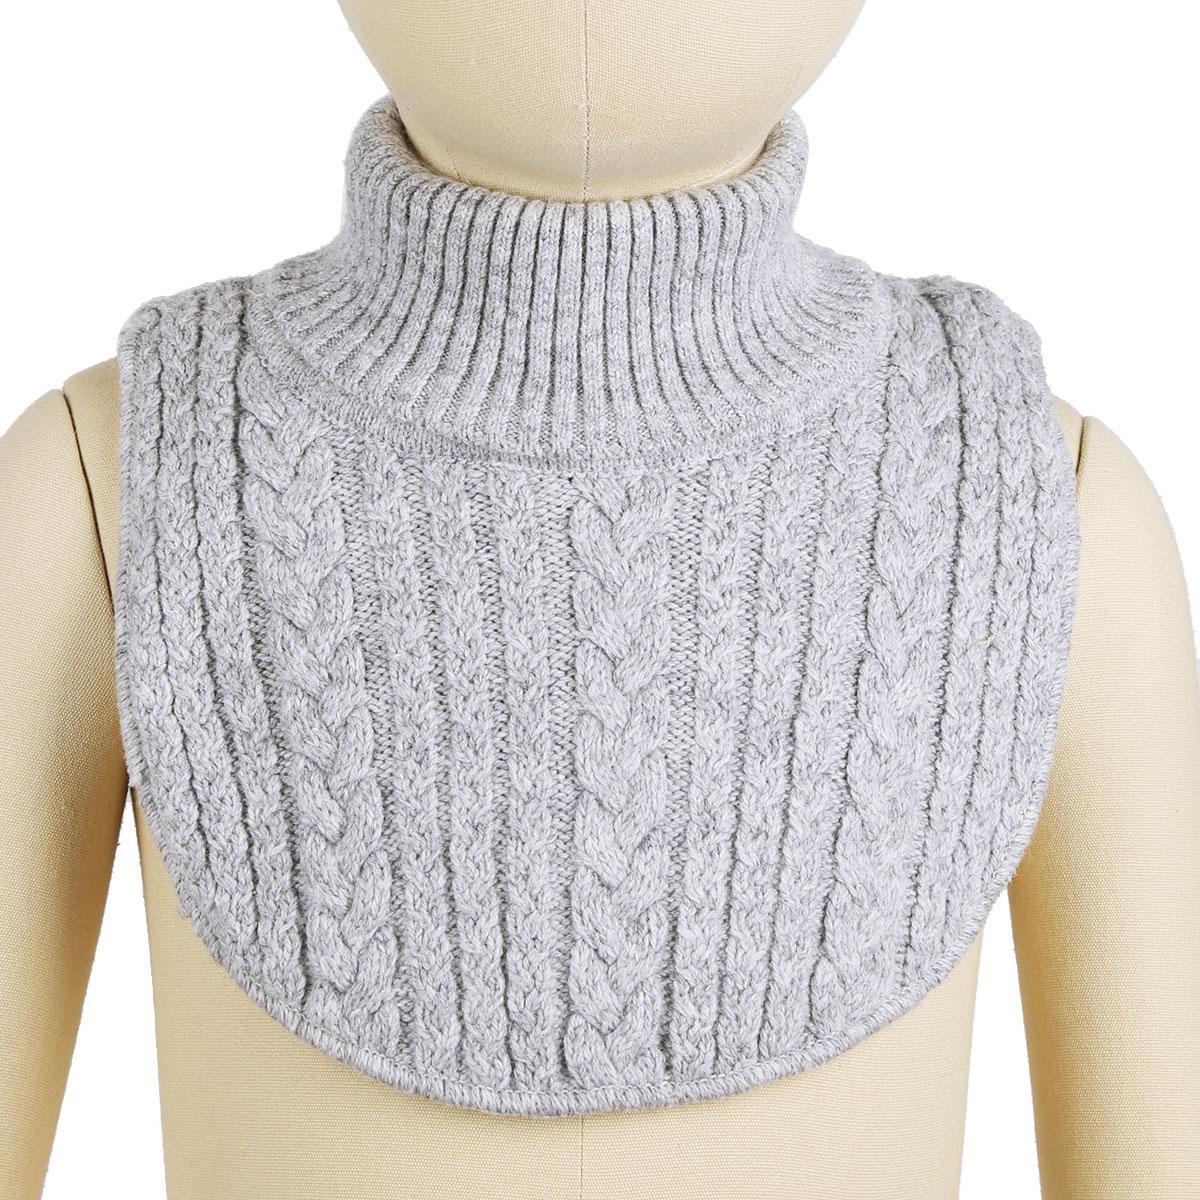 Boy's Tie Latest Collection Of Baby Childrens Neck Gaiter Scarf Fake Collar Kraagjes Dames Baby Turtleneck Warmer Sweater Collar Neck Cover Lightweight Collar